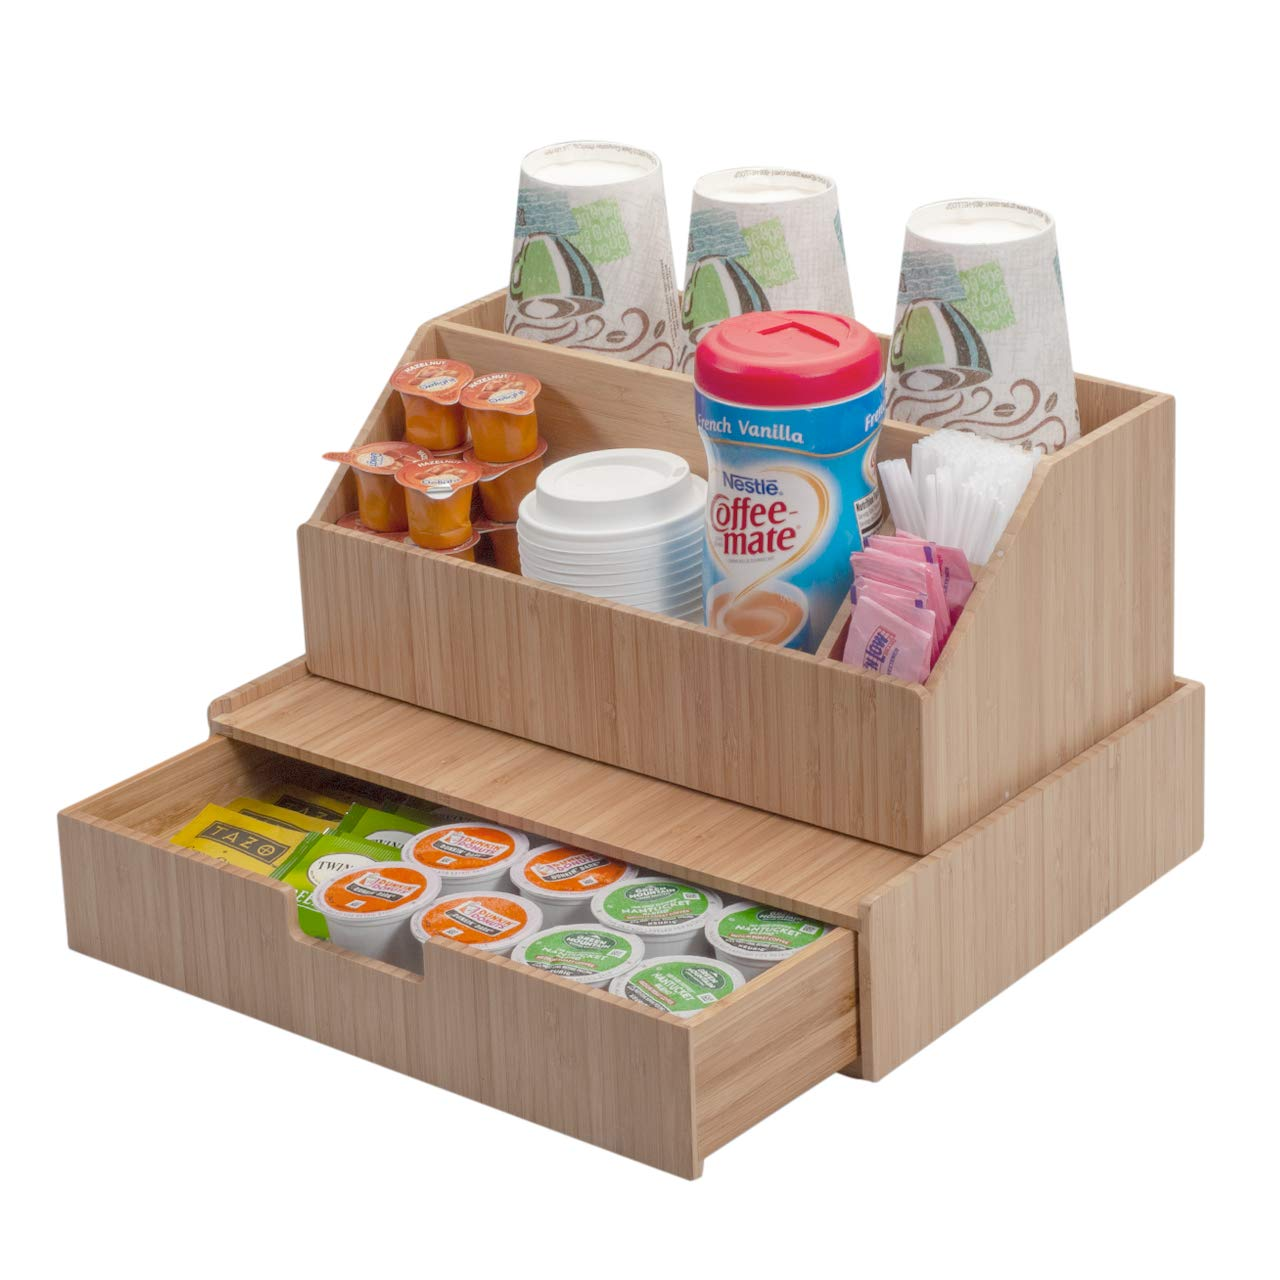 Bamboo Drawer Plus All-In-One Complete Condiment & Accessory Combo Organize K-Cups, Espresso Pods, Tea, Disposable Cups & Lids, Sugars, Creamer & more